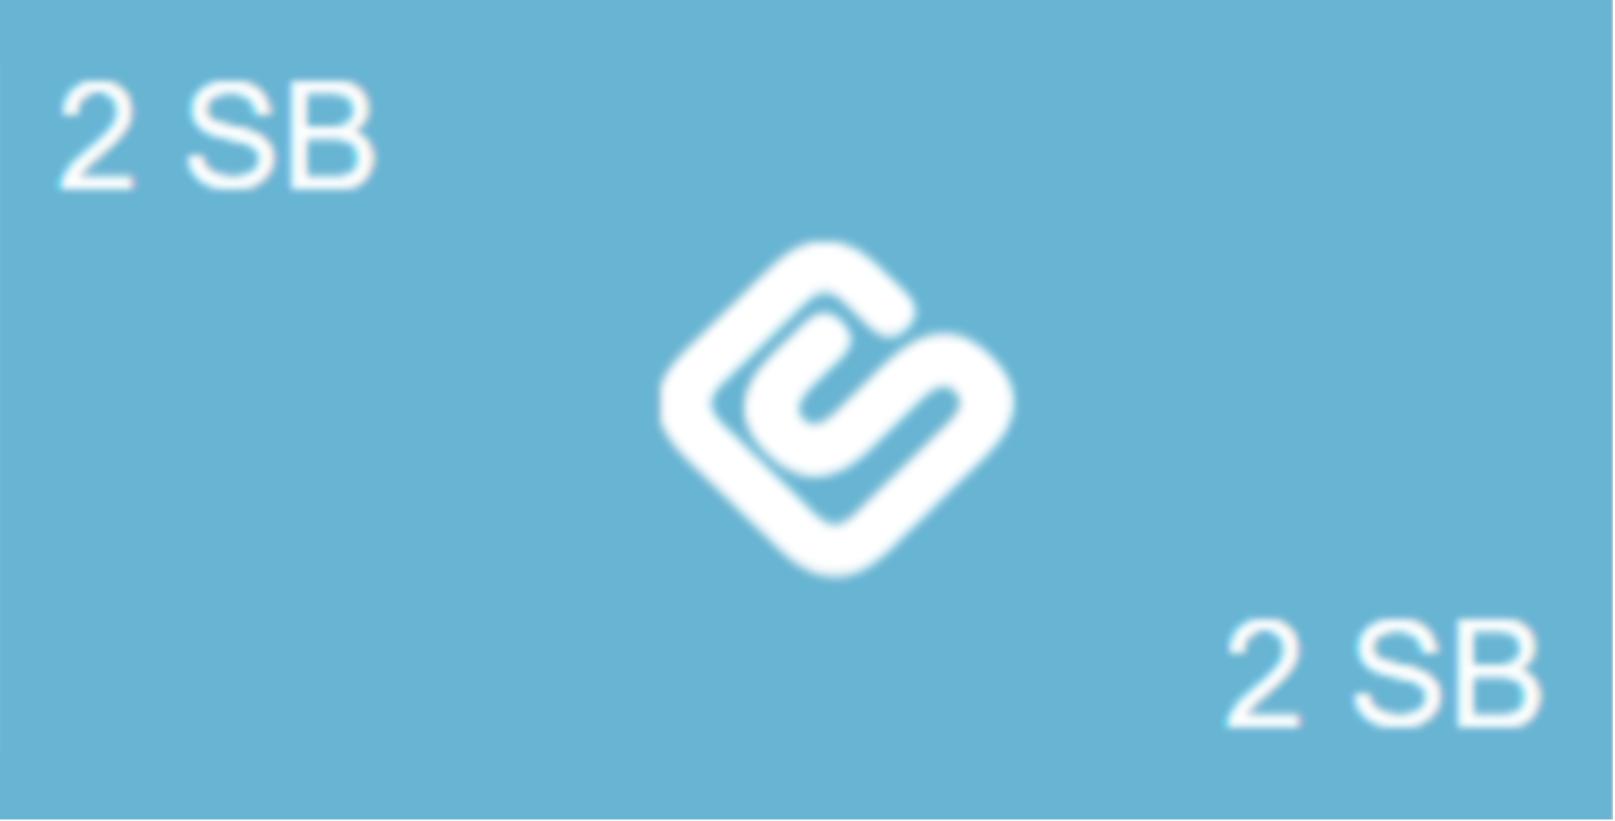 Pin by ezSwag on SwagBucks Coding, Expedia coupon, Fall